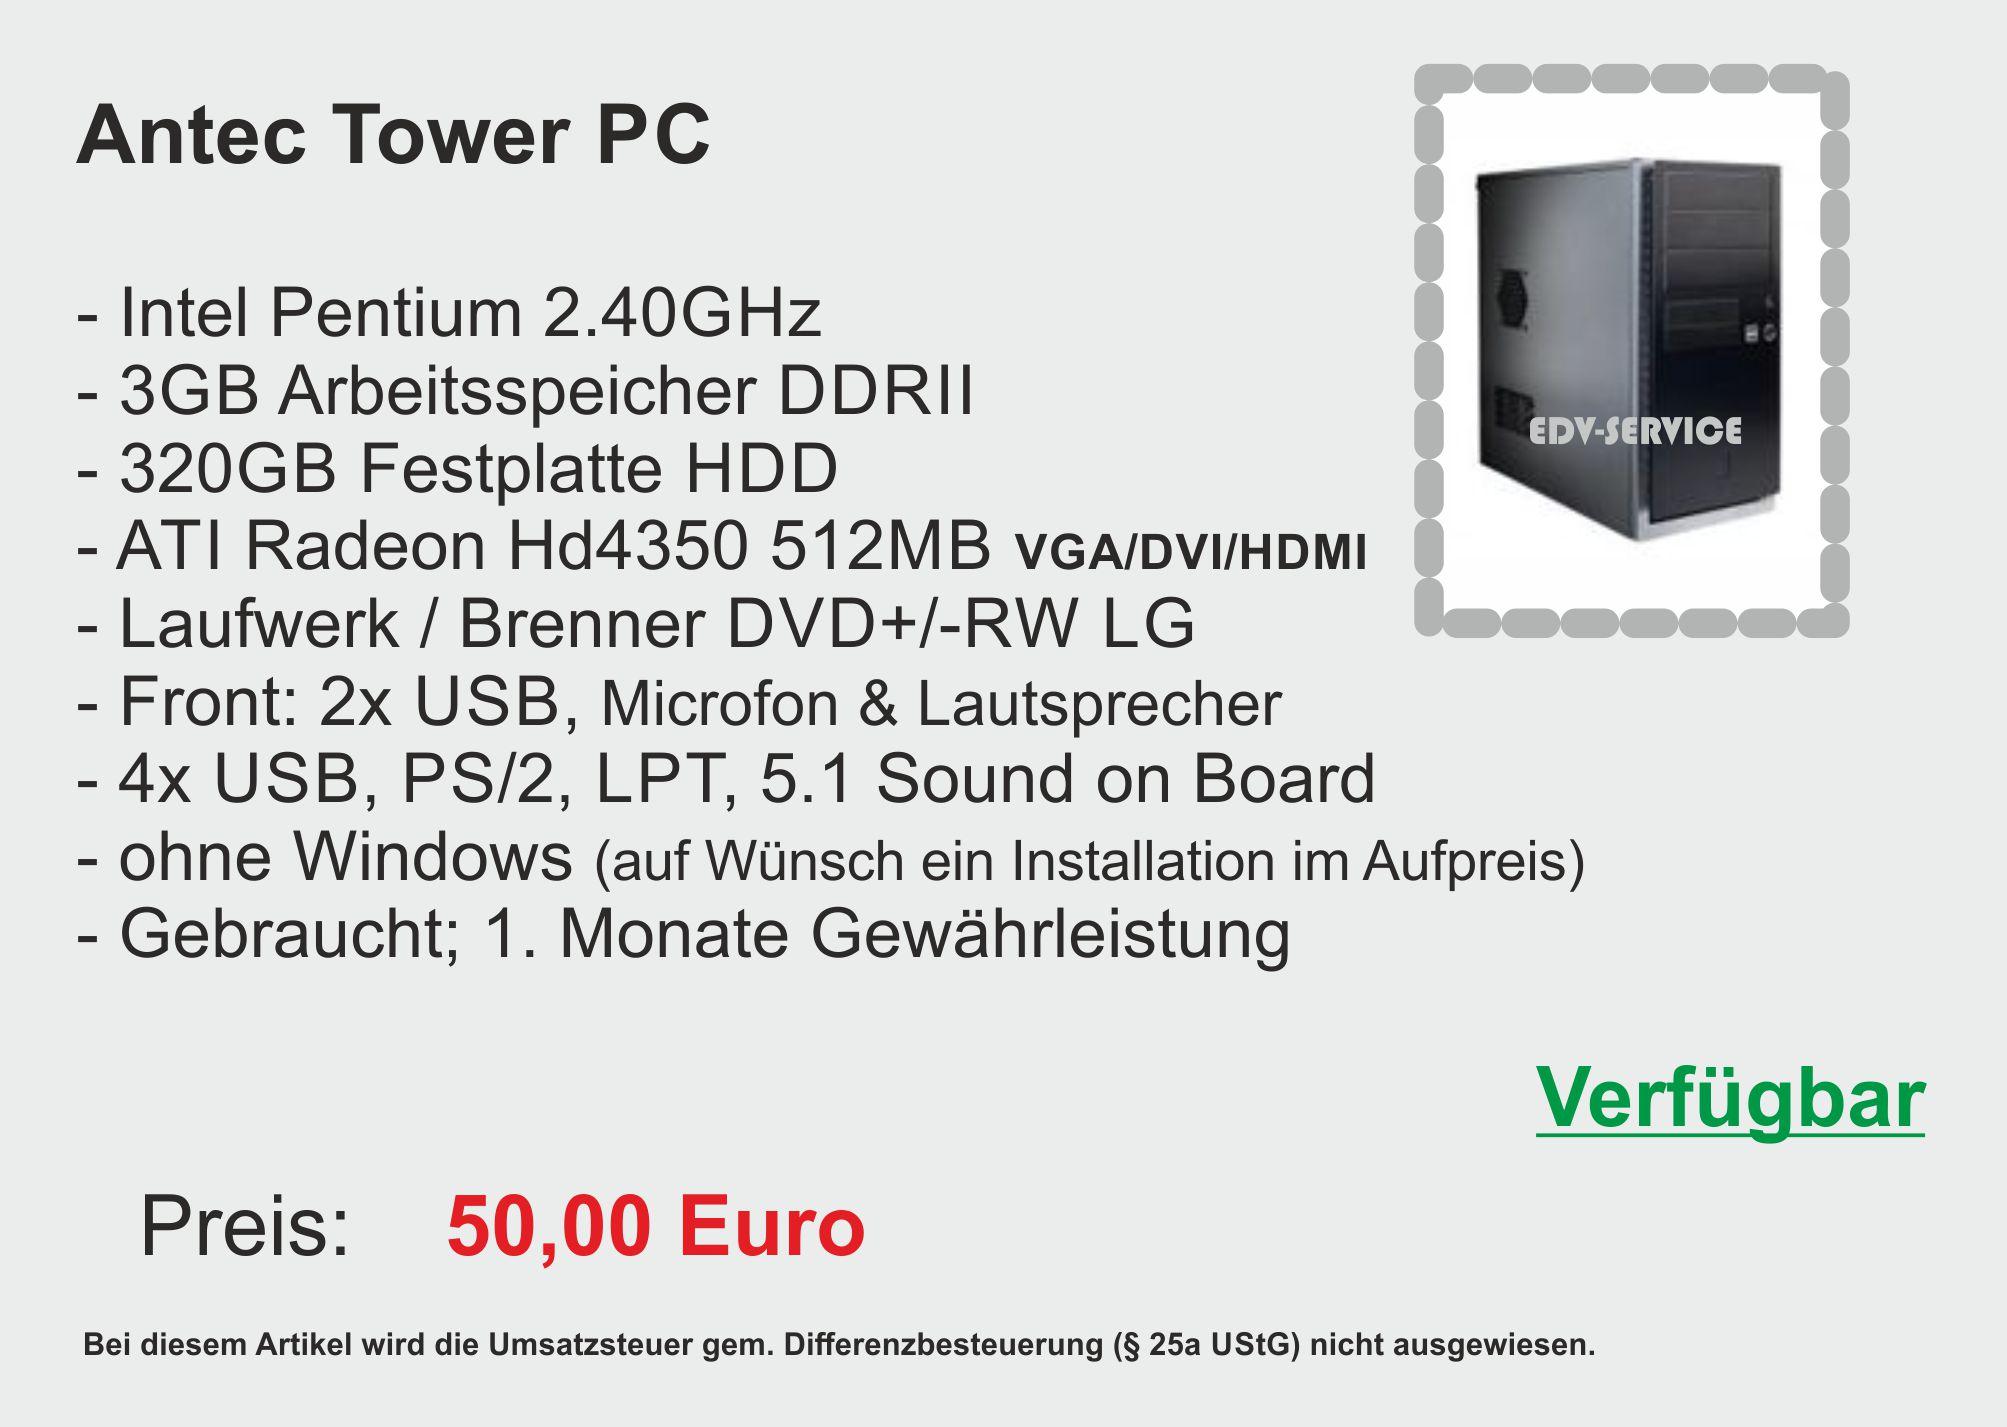 Antec Tower